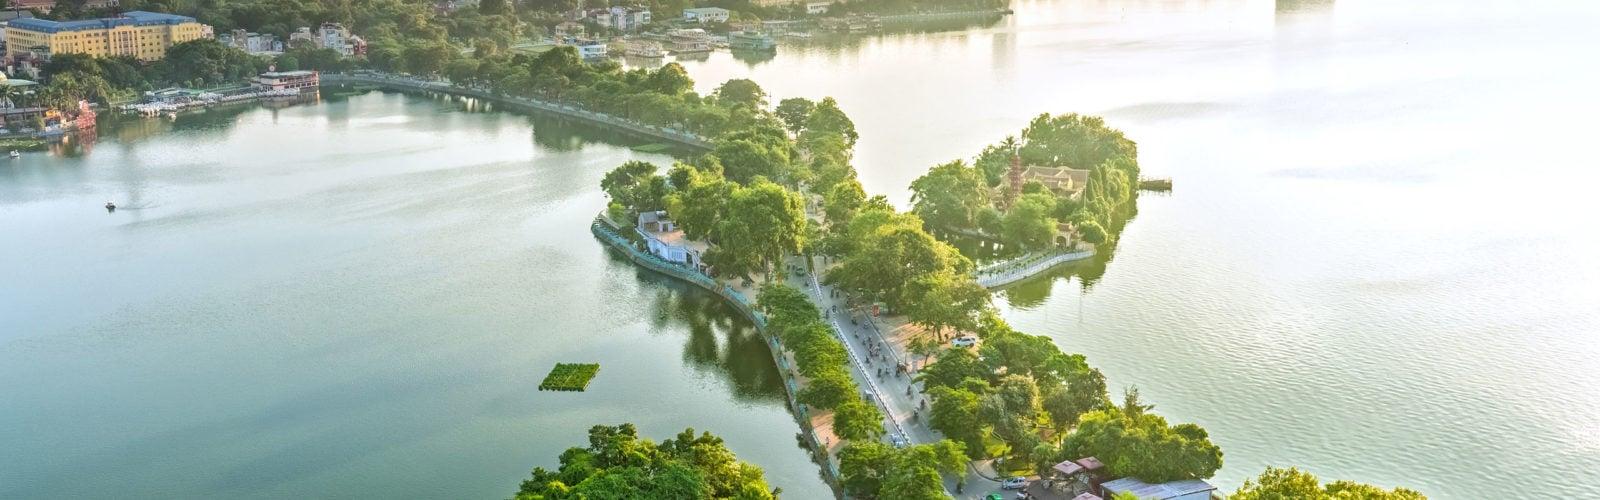 The road crossing the island Westlake, Hanoi, Vietnam